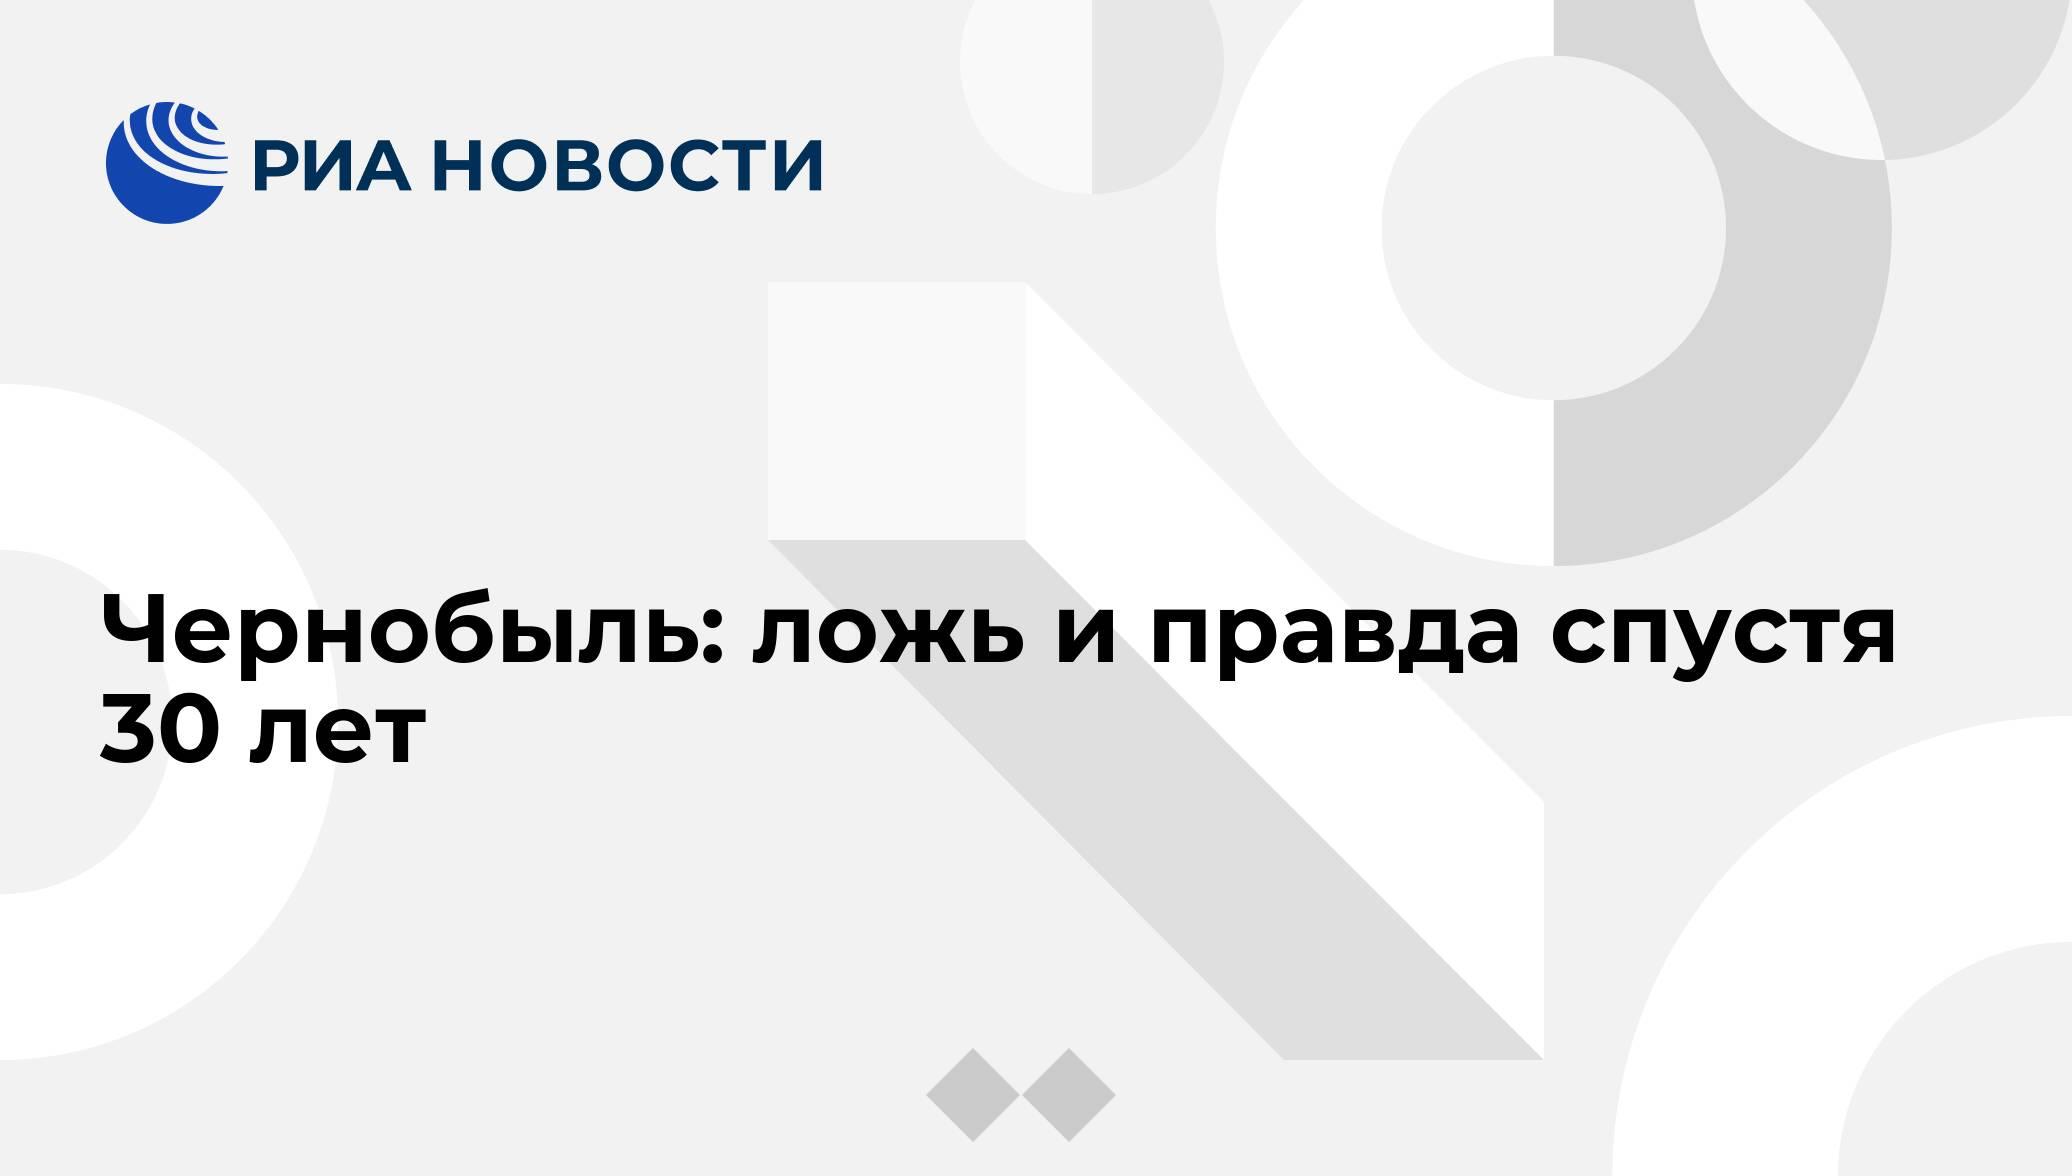 https://cdn21.img.ria.ru/images/sharing/article/1416978532.jpg?9347561971461663142